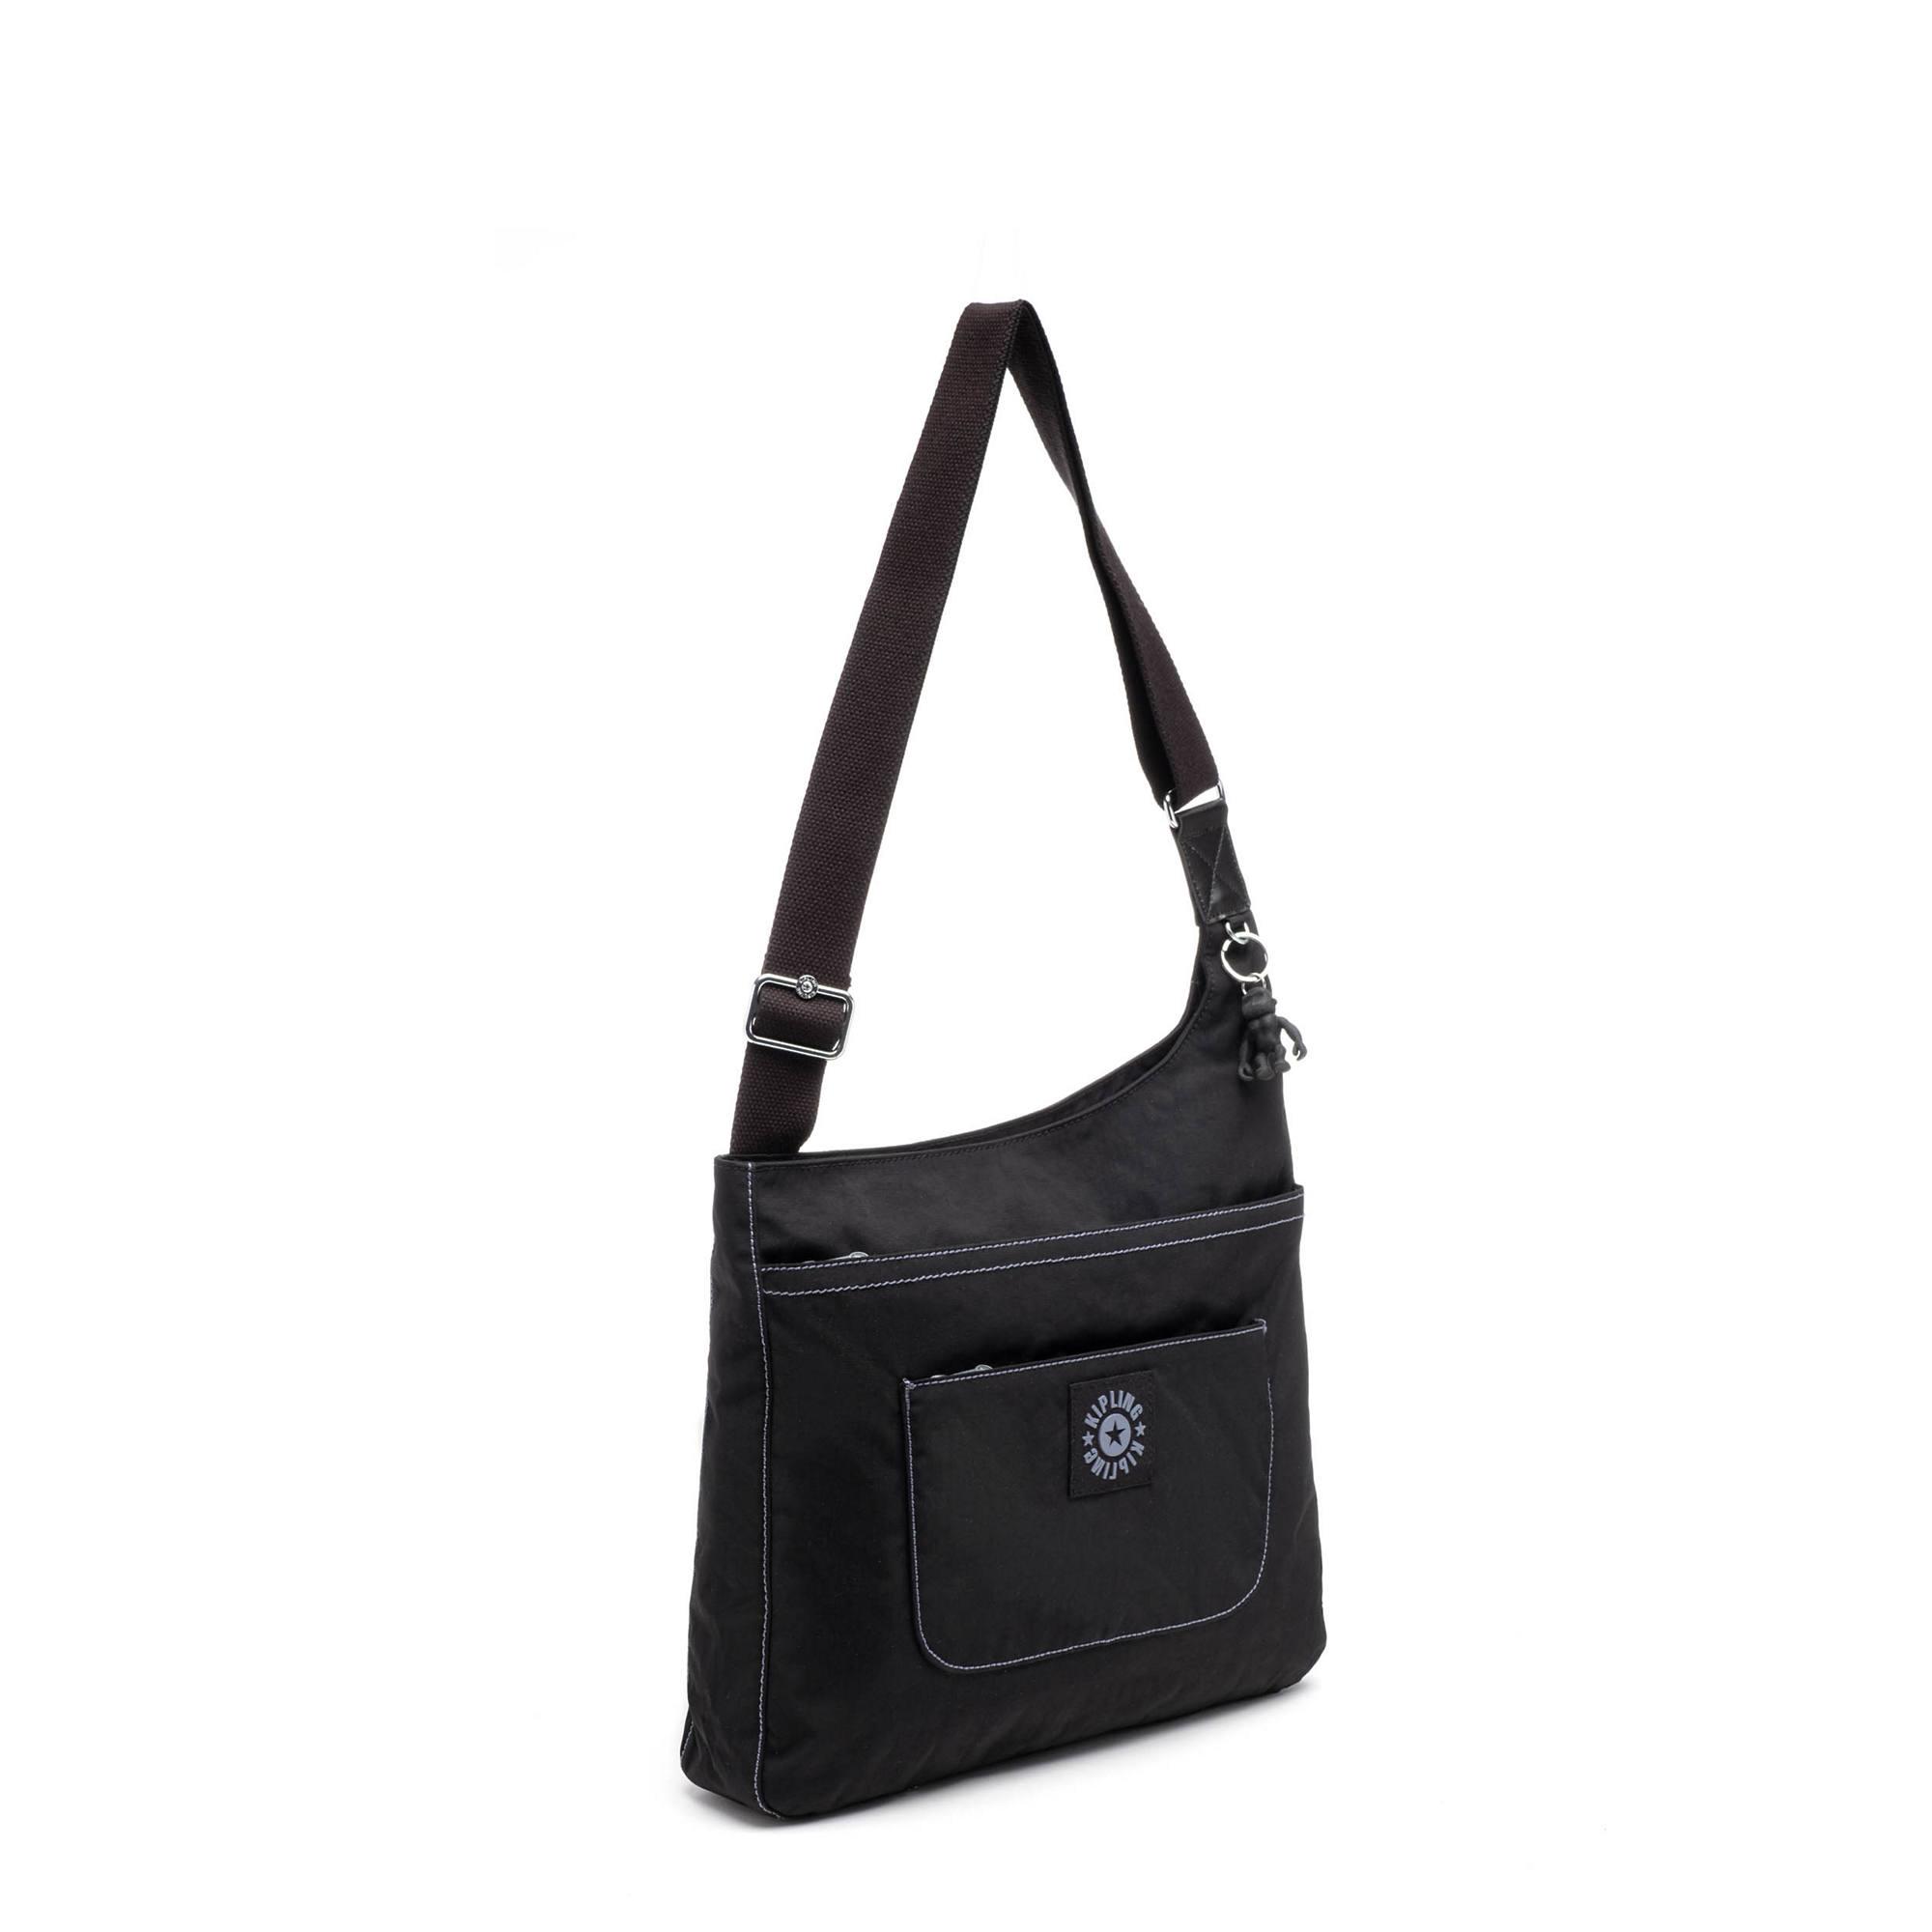 7a052fbc3 Delilah Crossbody Bag,Black Tonal Zipper,large-zoomed